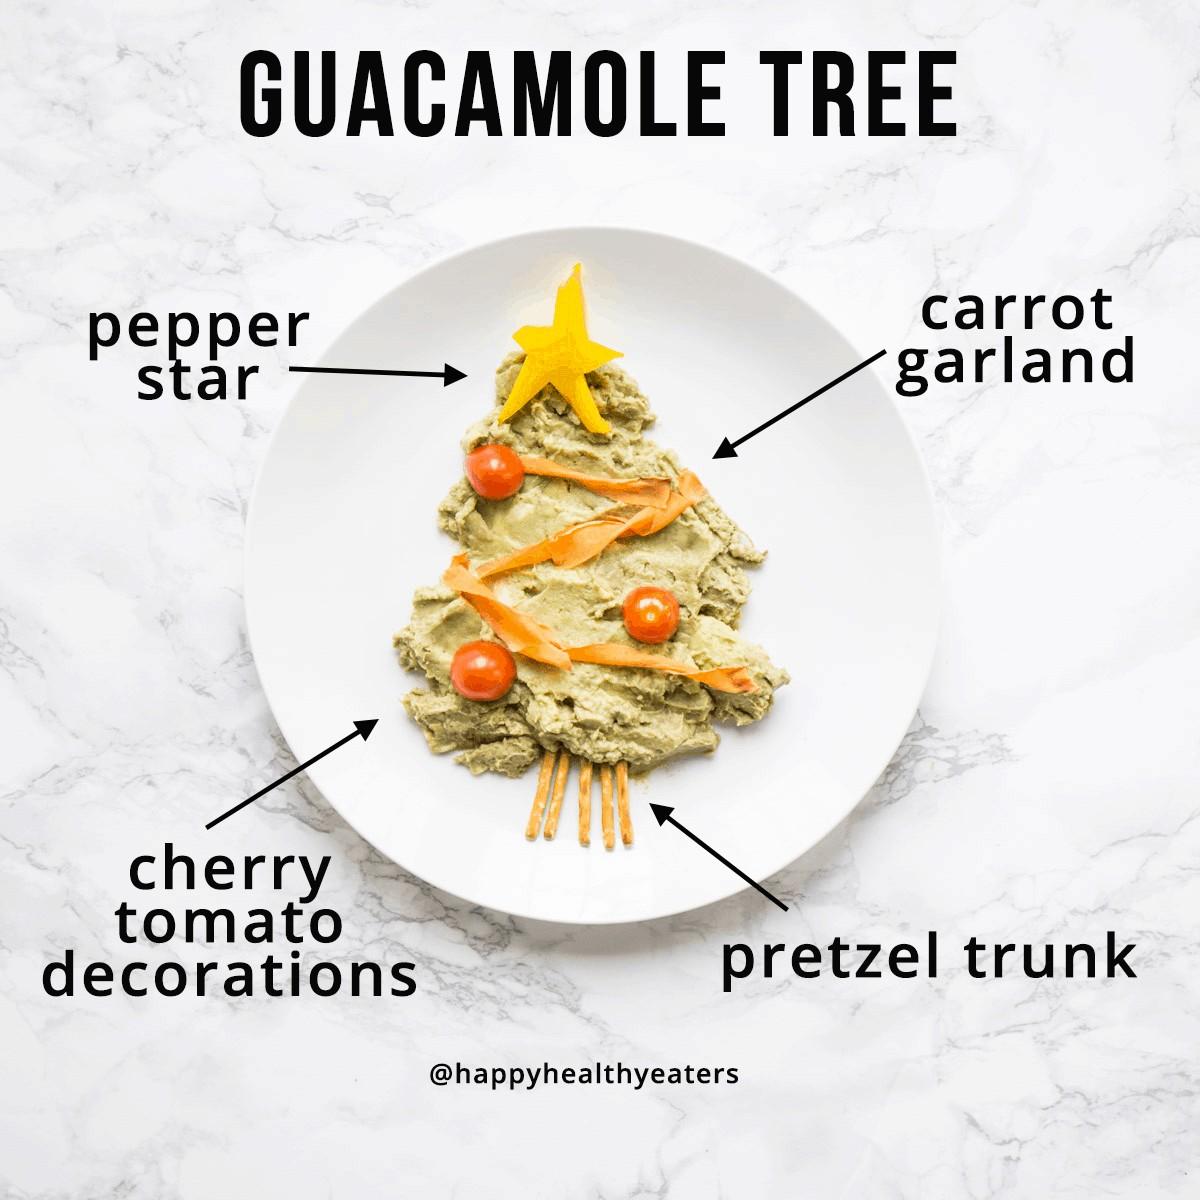 Christmas Snacks: Healthy and Easy! Guacamole Christmas Tree